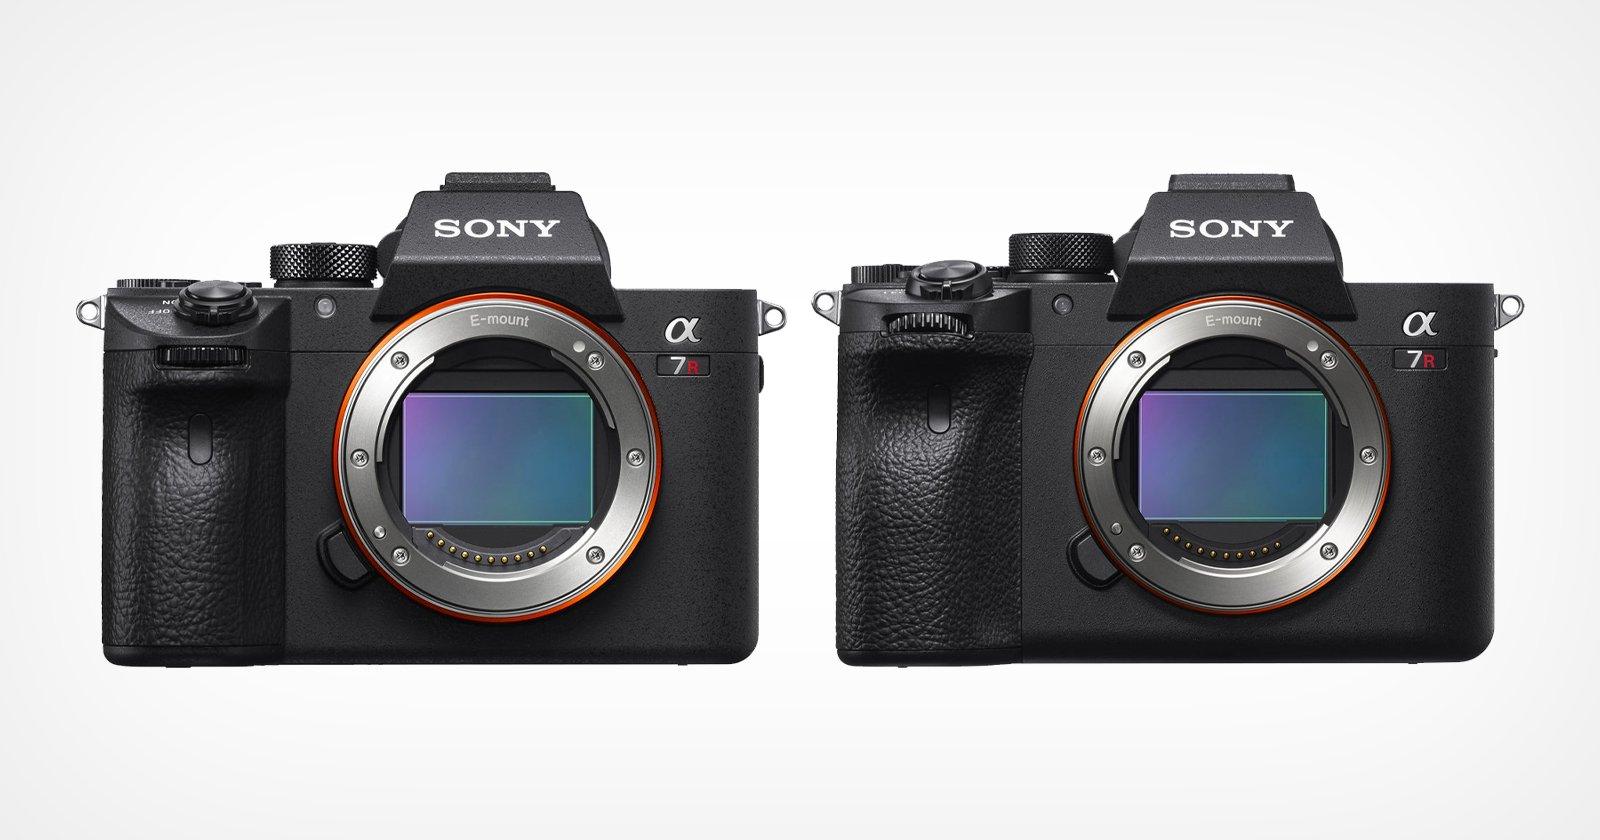 Sony lancia silenziosamente le fotocamere mirrorless a7R IIIa e a7R IVa